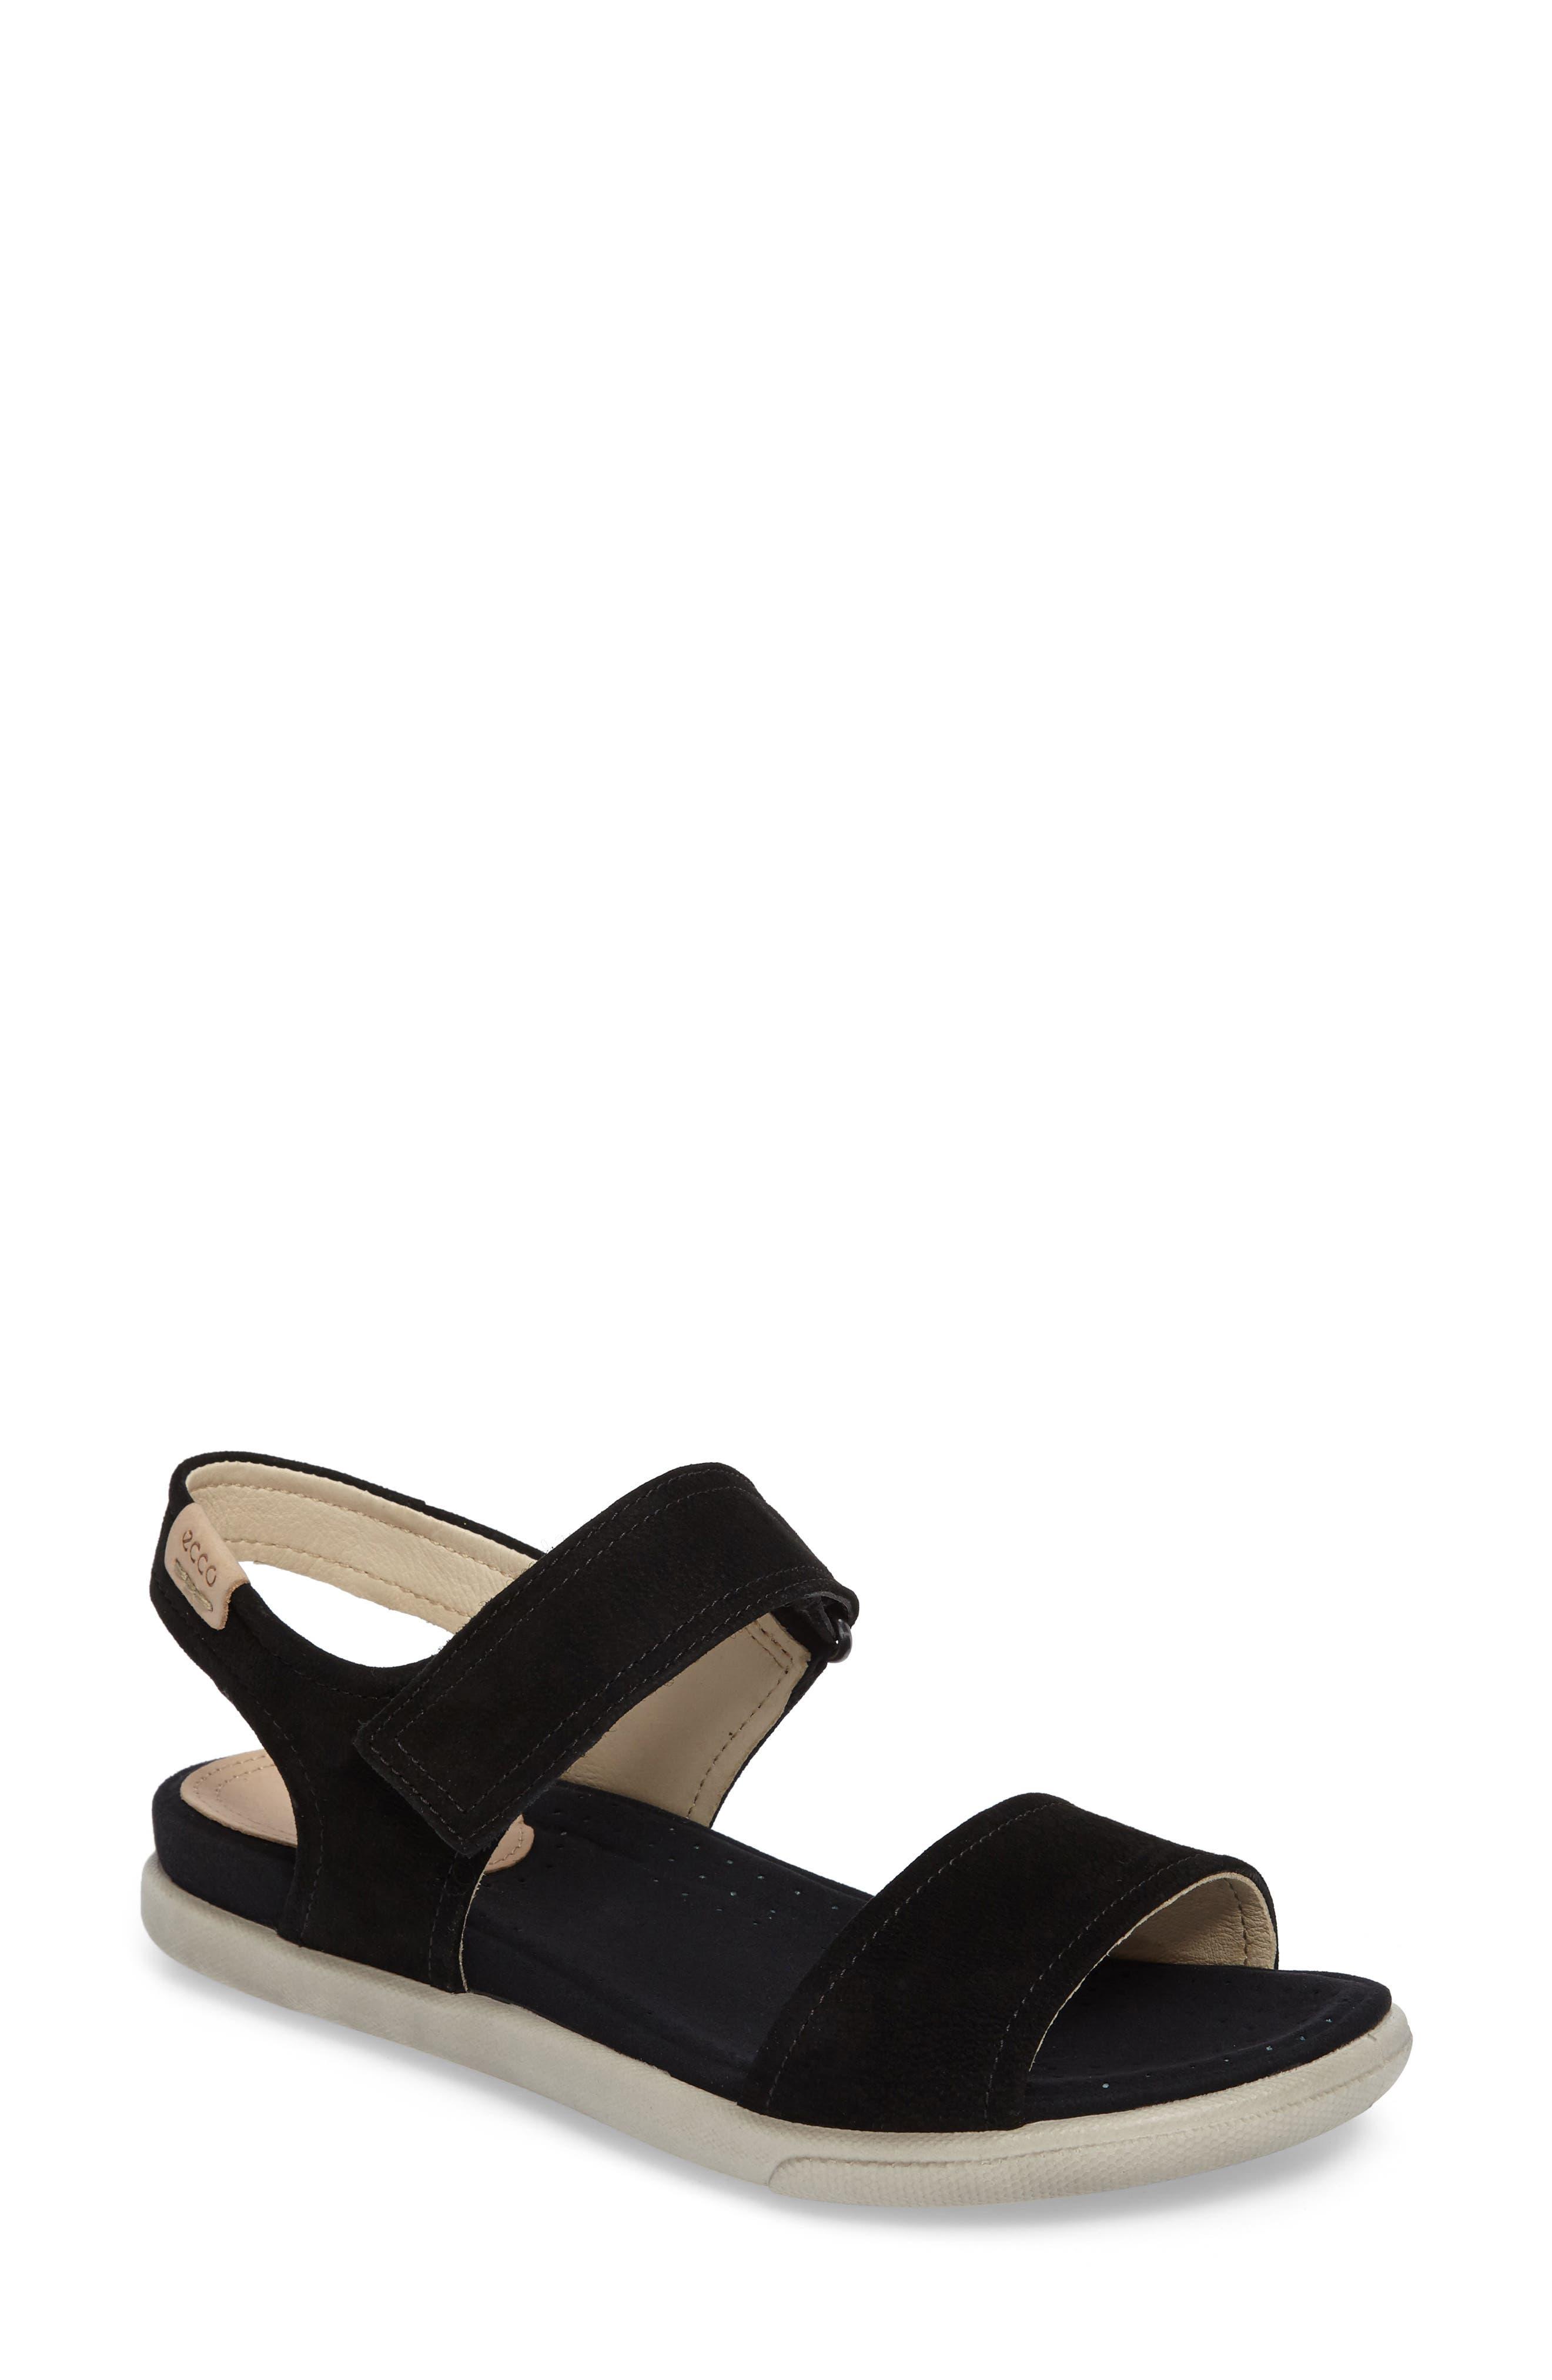 'Damara' Strap Sandal,                         Main,                         color,